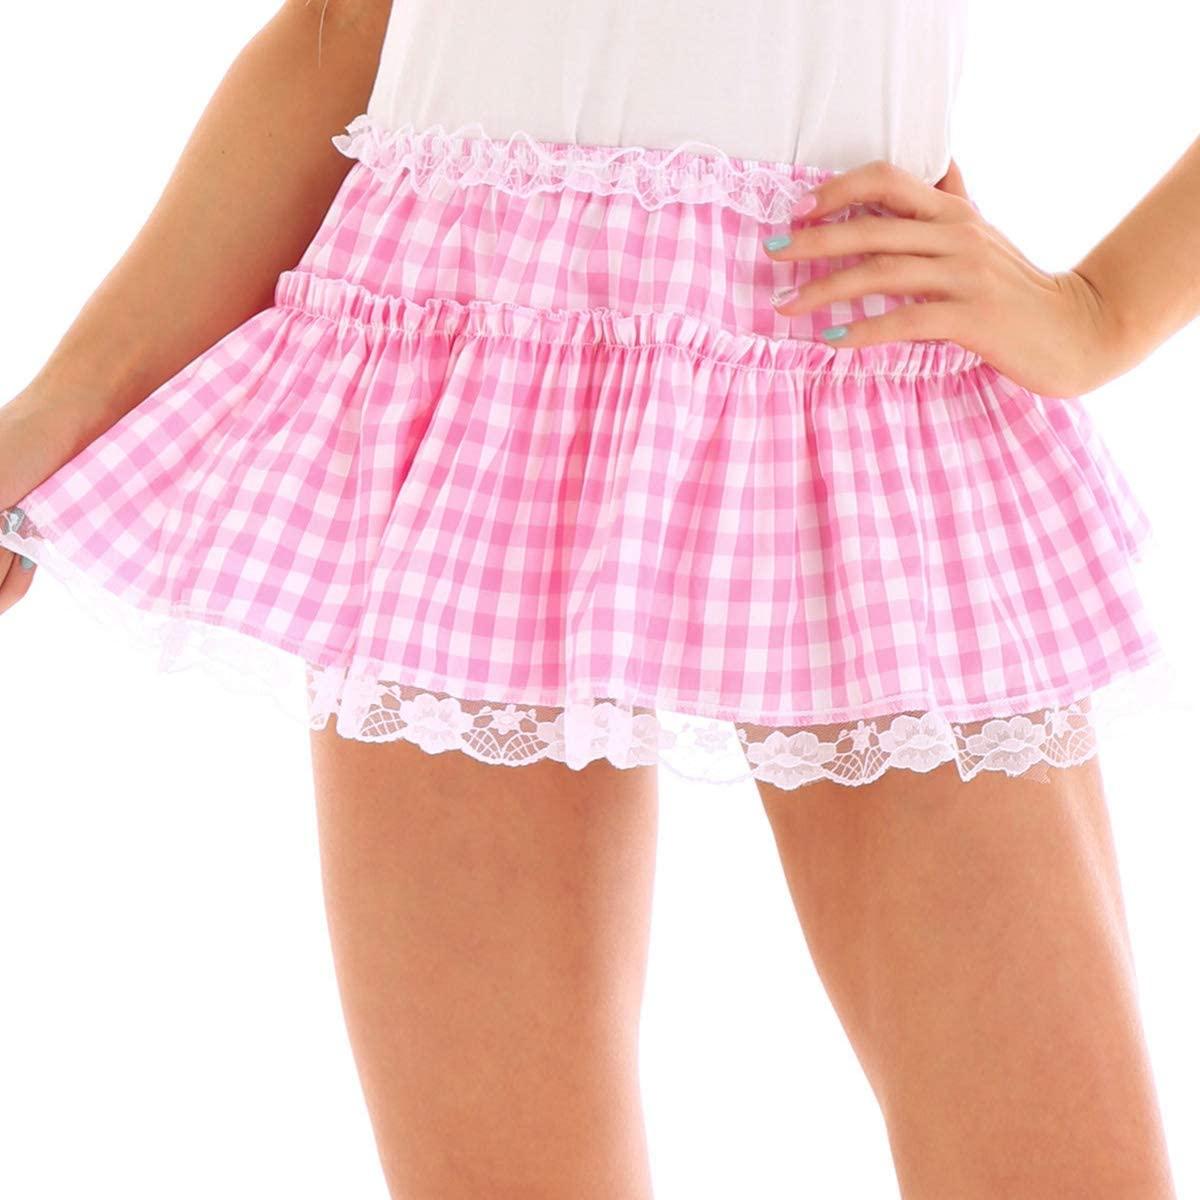 Yartina Women's Gingham Lace Hem A-line Pleated Mini Skirt Sissy Adult Baby Dress Nightwear